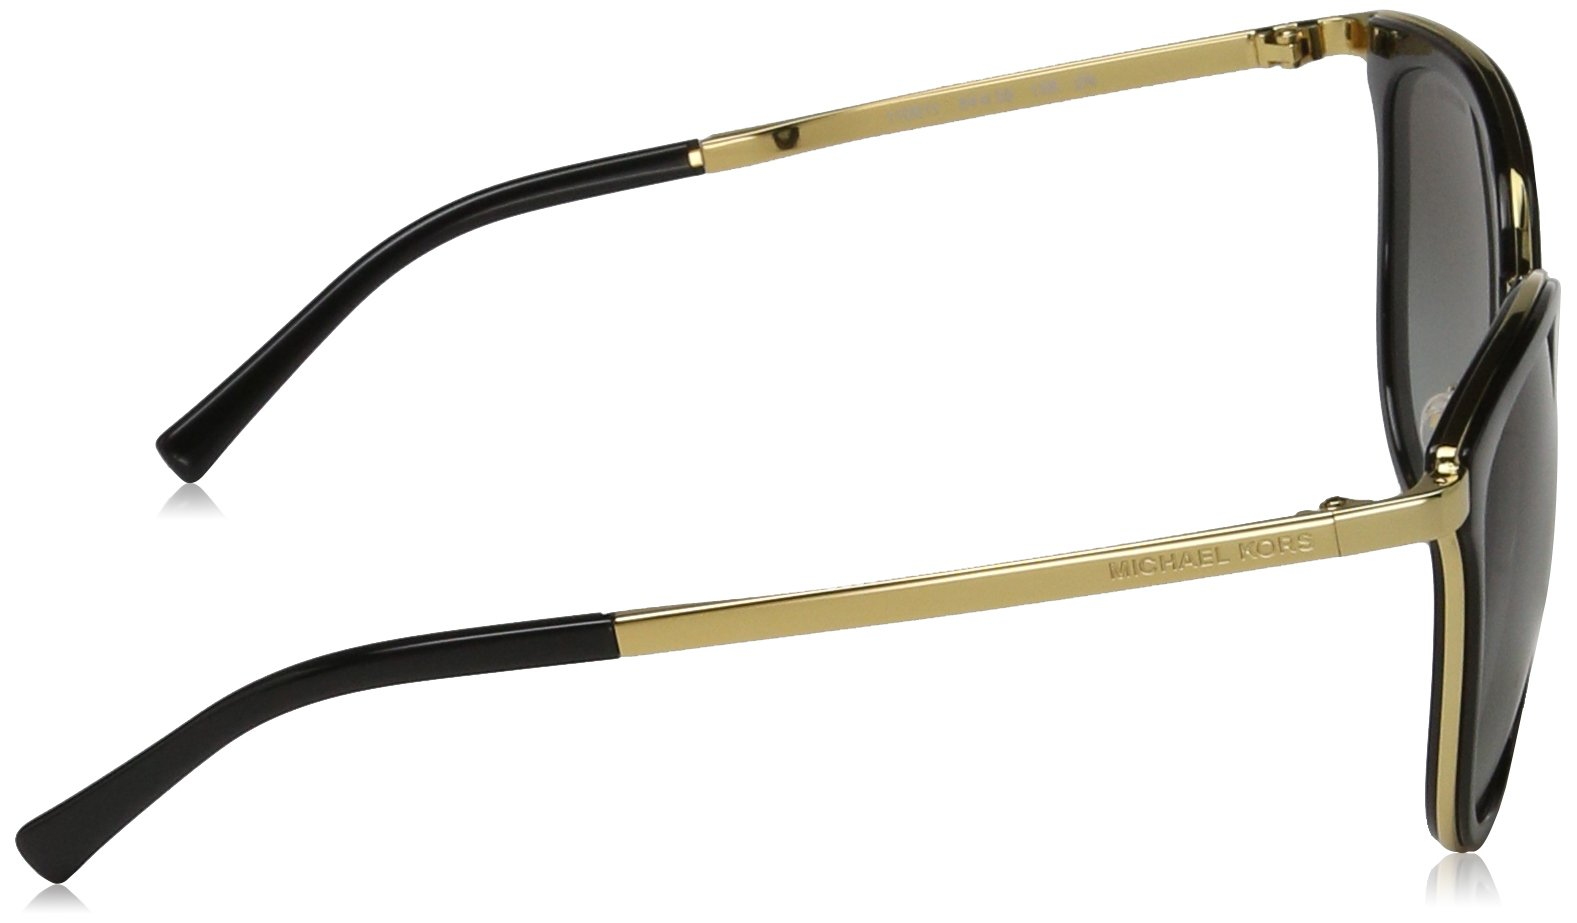 Michael Kors Women's Adrianna I MK1010 Black/Gold Sunglasses by Michael Kors (Image #3)